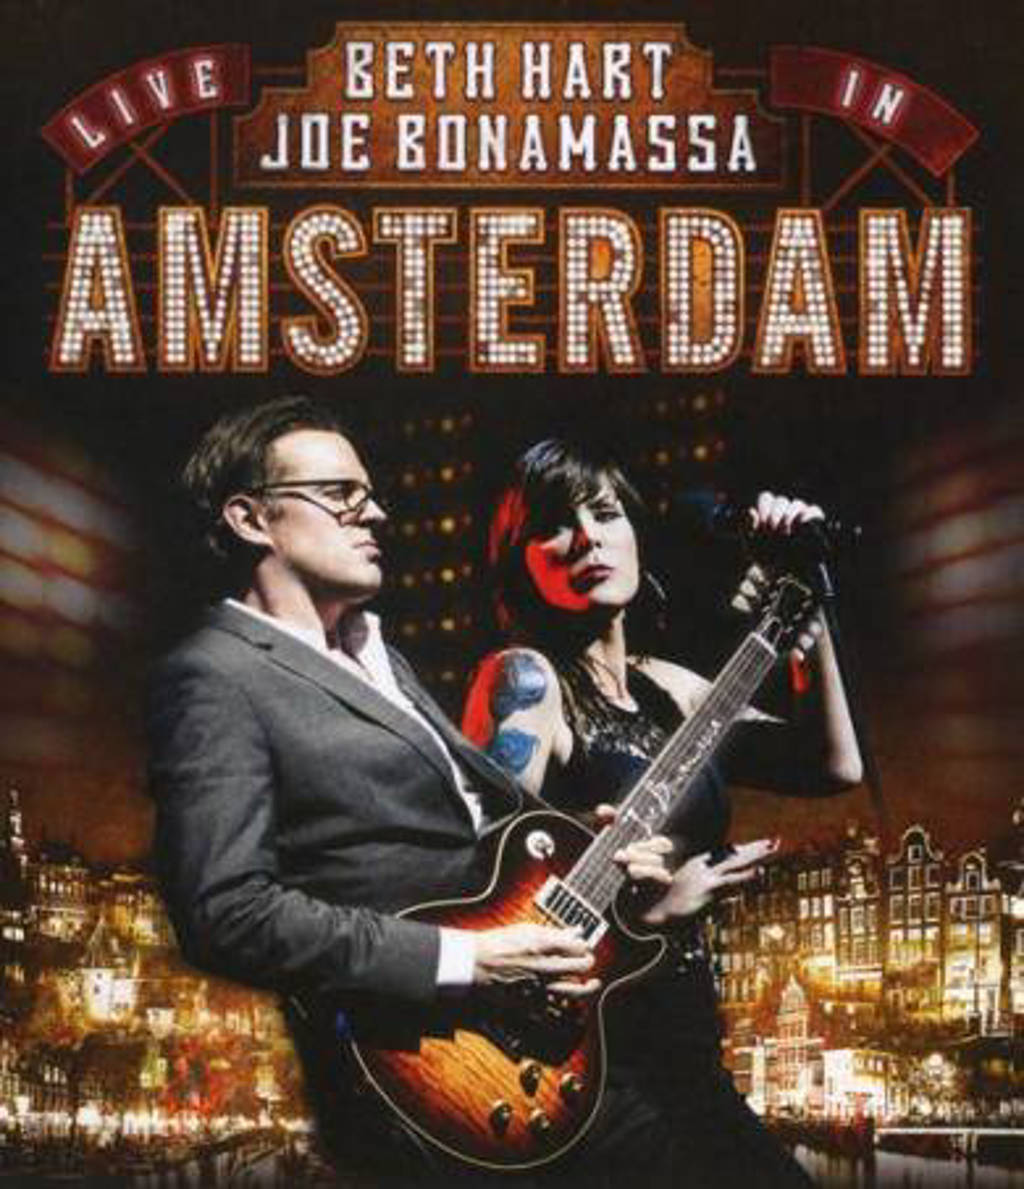 Beth Hart & Joe Bonamassa - Live In Amsterdam (Blu-ray)